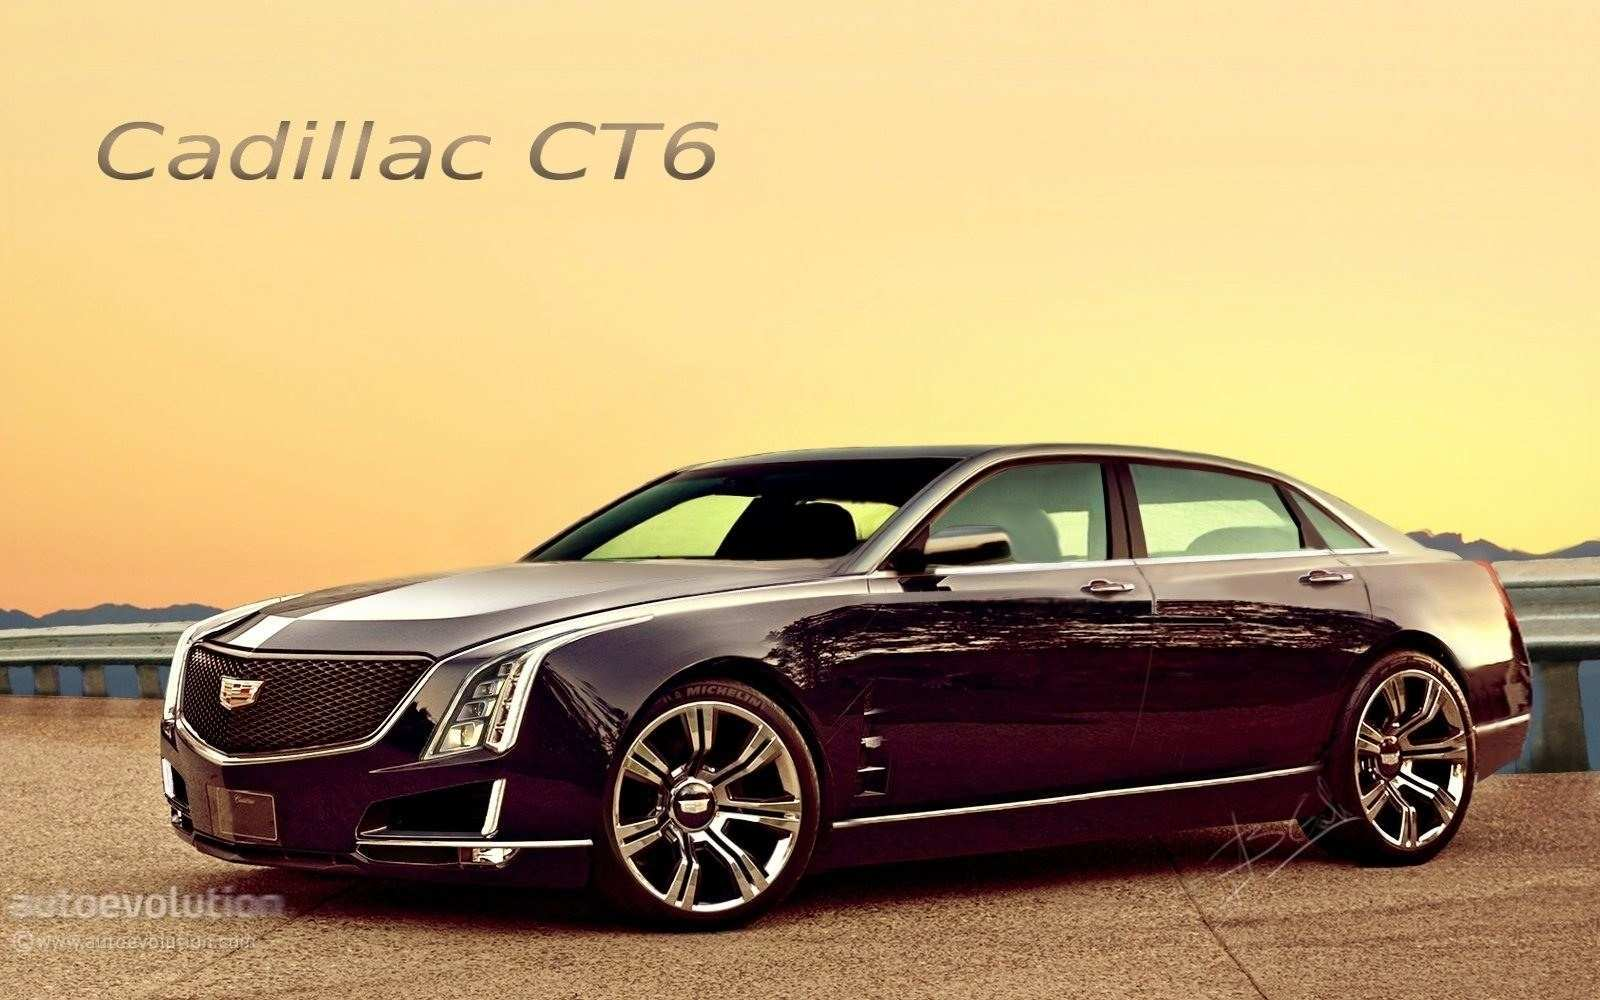 46 New 2020 Cadillac Eldorado Redesign and Concept with 2020 Cadillac Eldorado